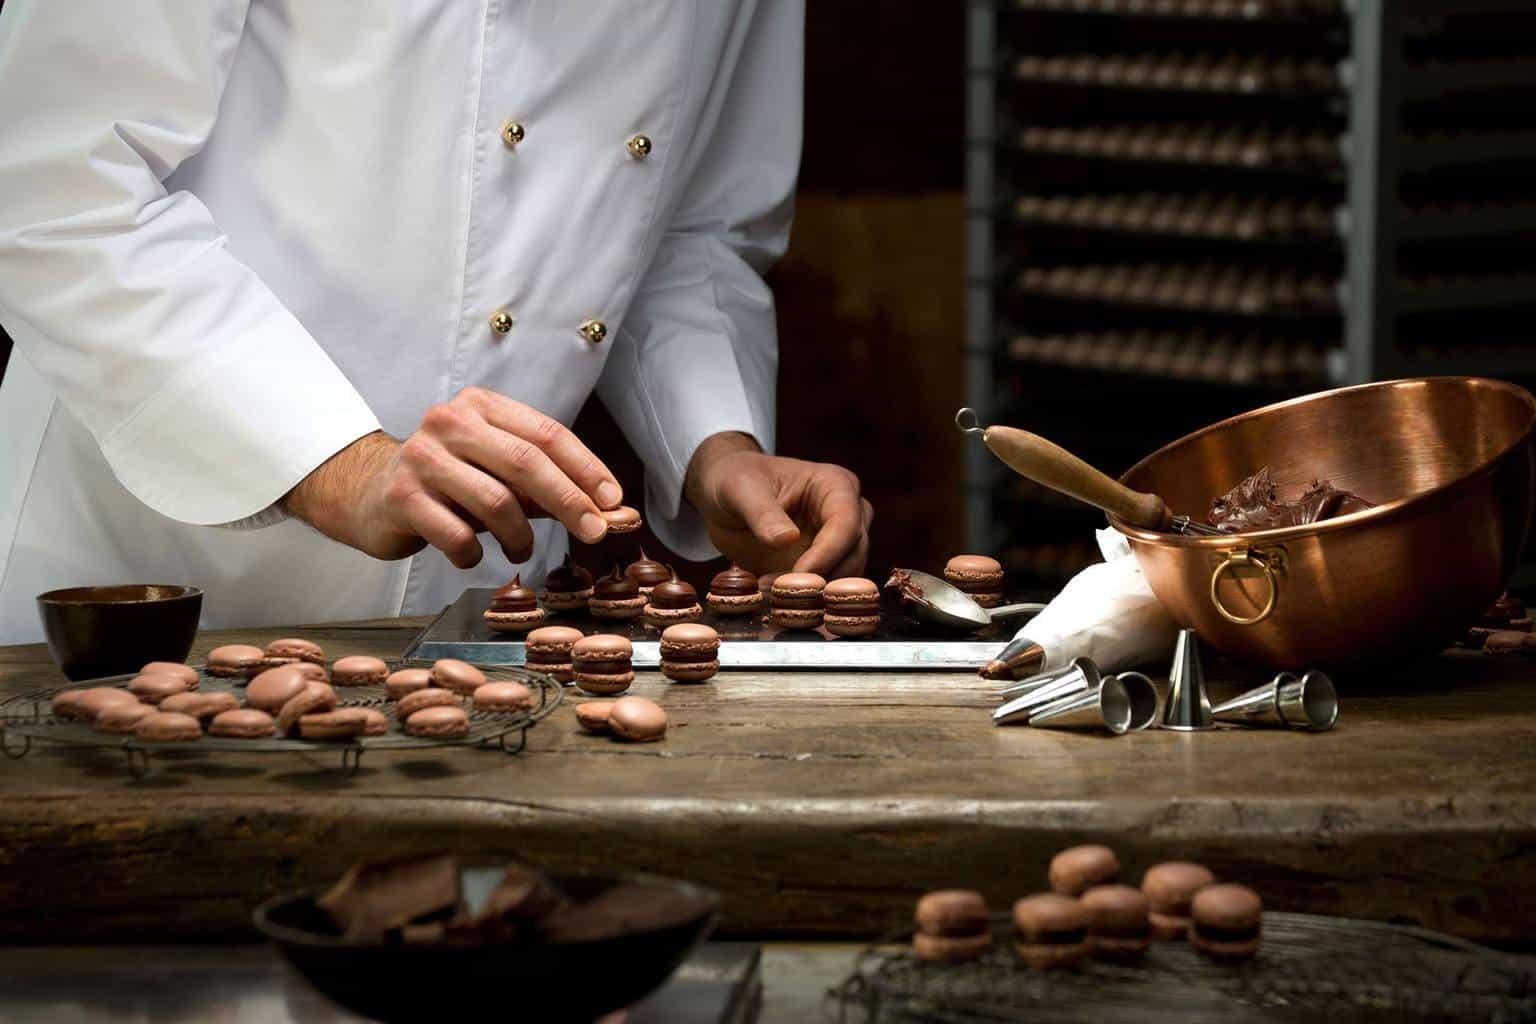 The Luxemburgerli - Zurich's Very Special Macaroon